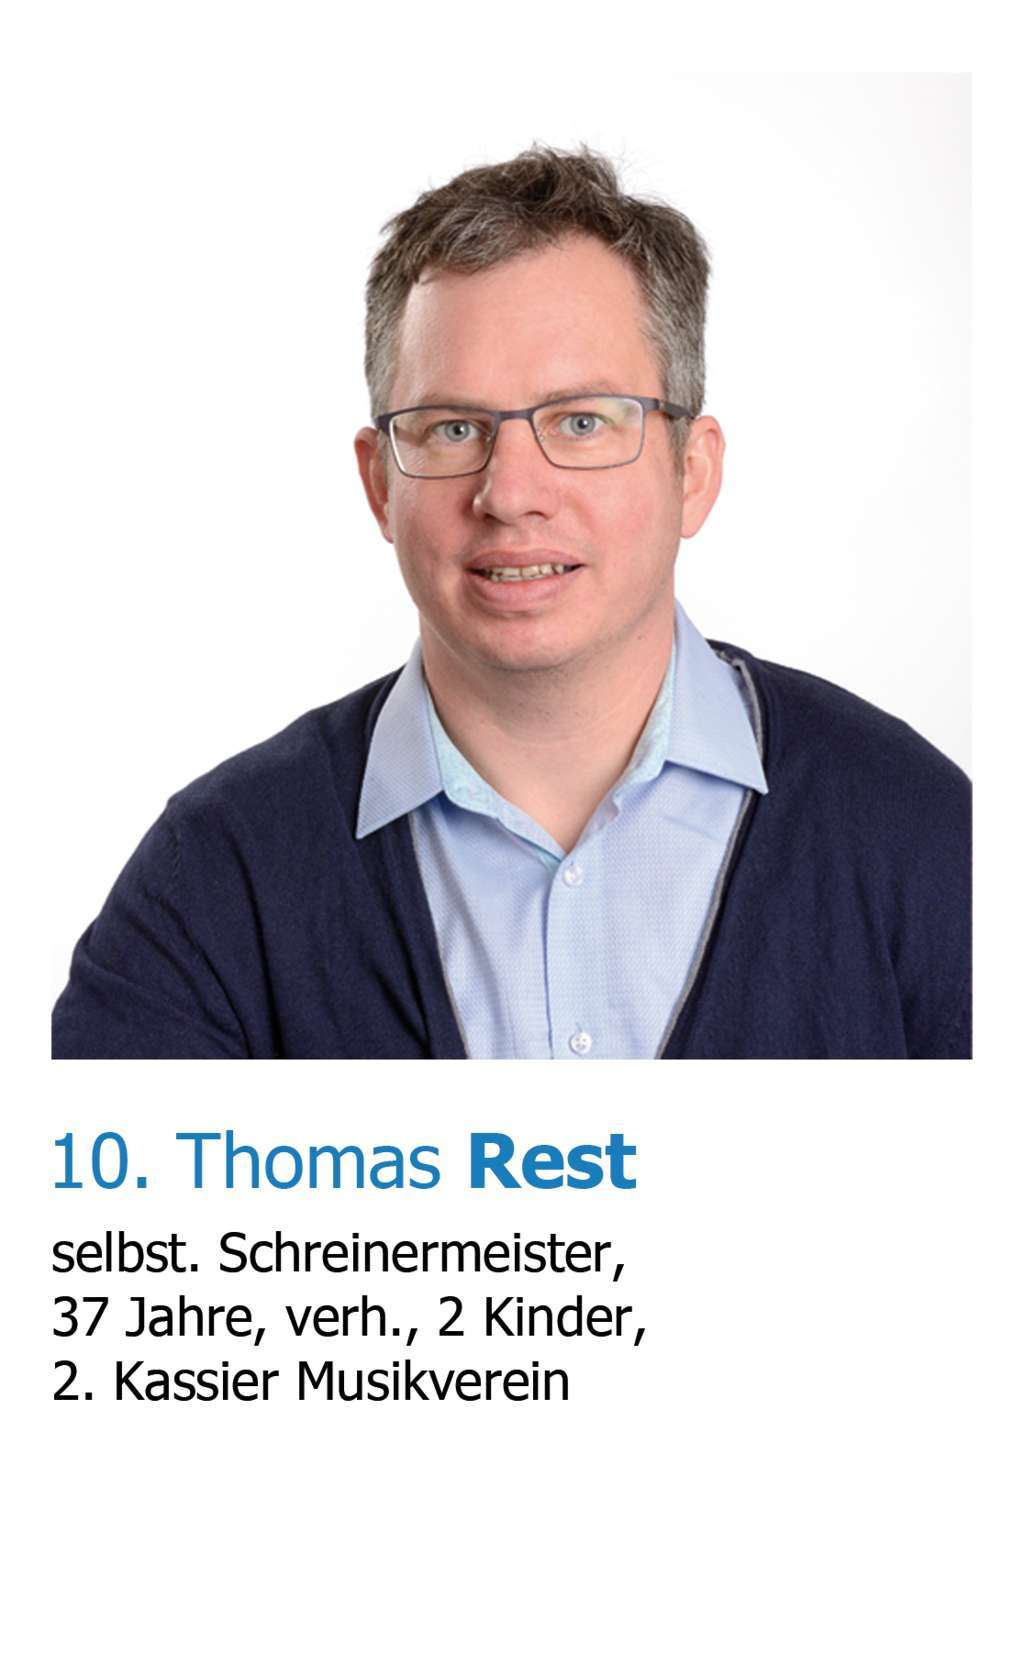 Thomas Rest